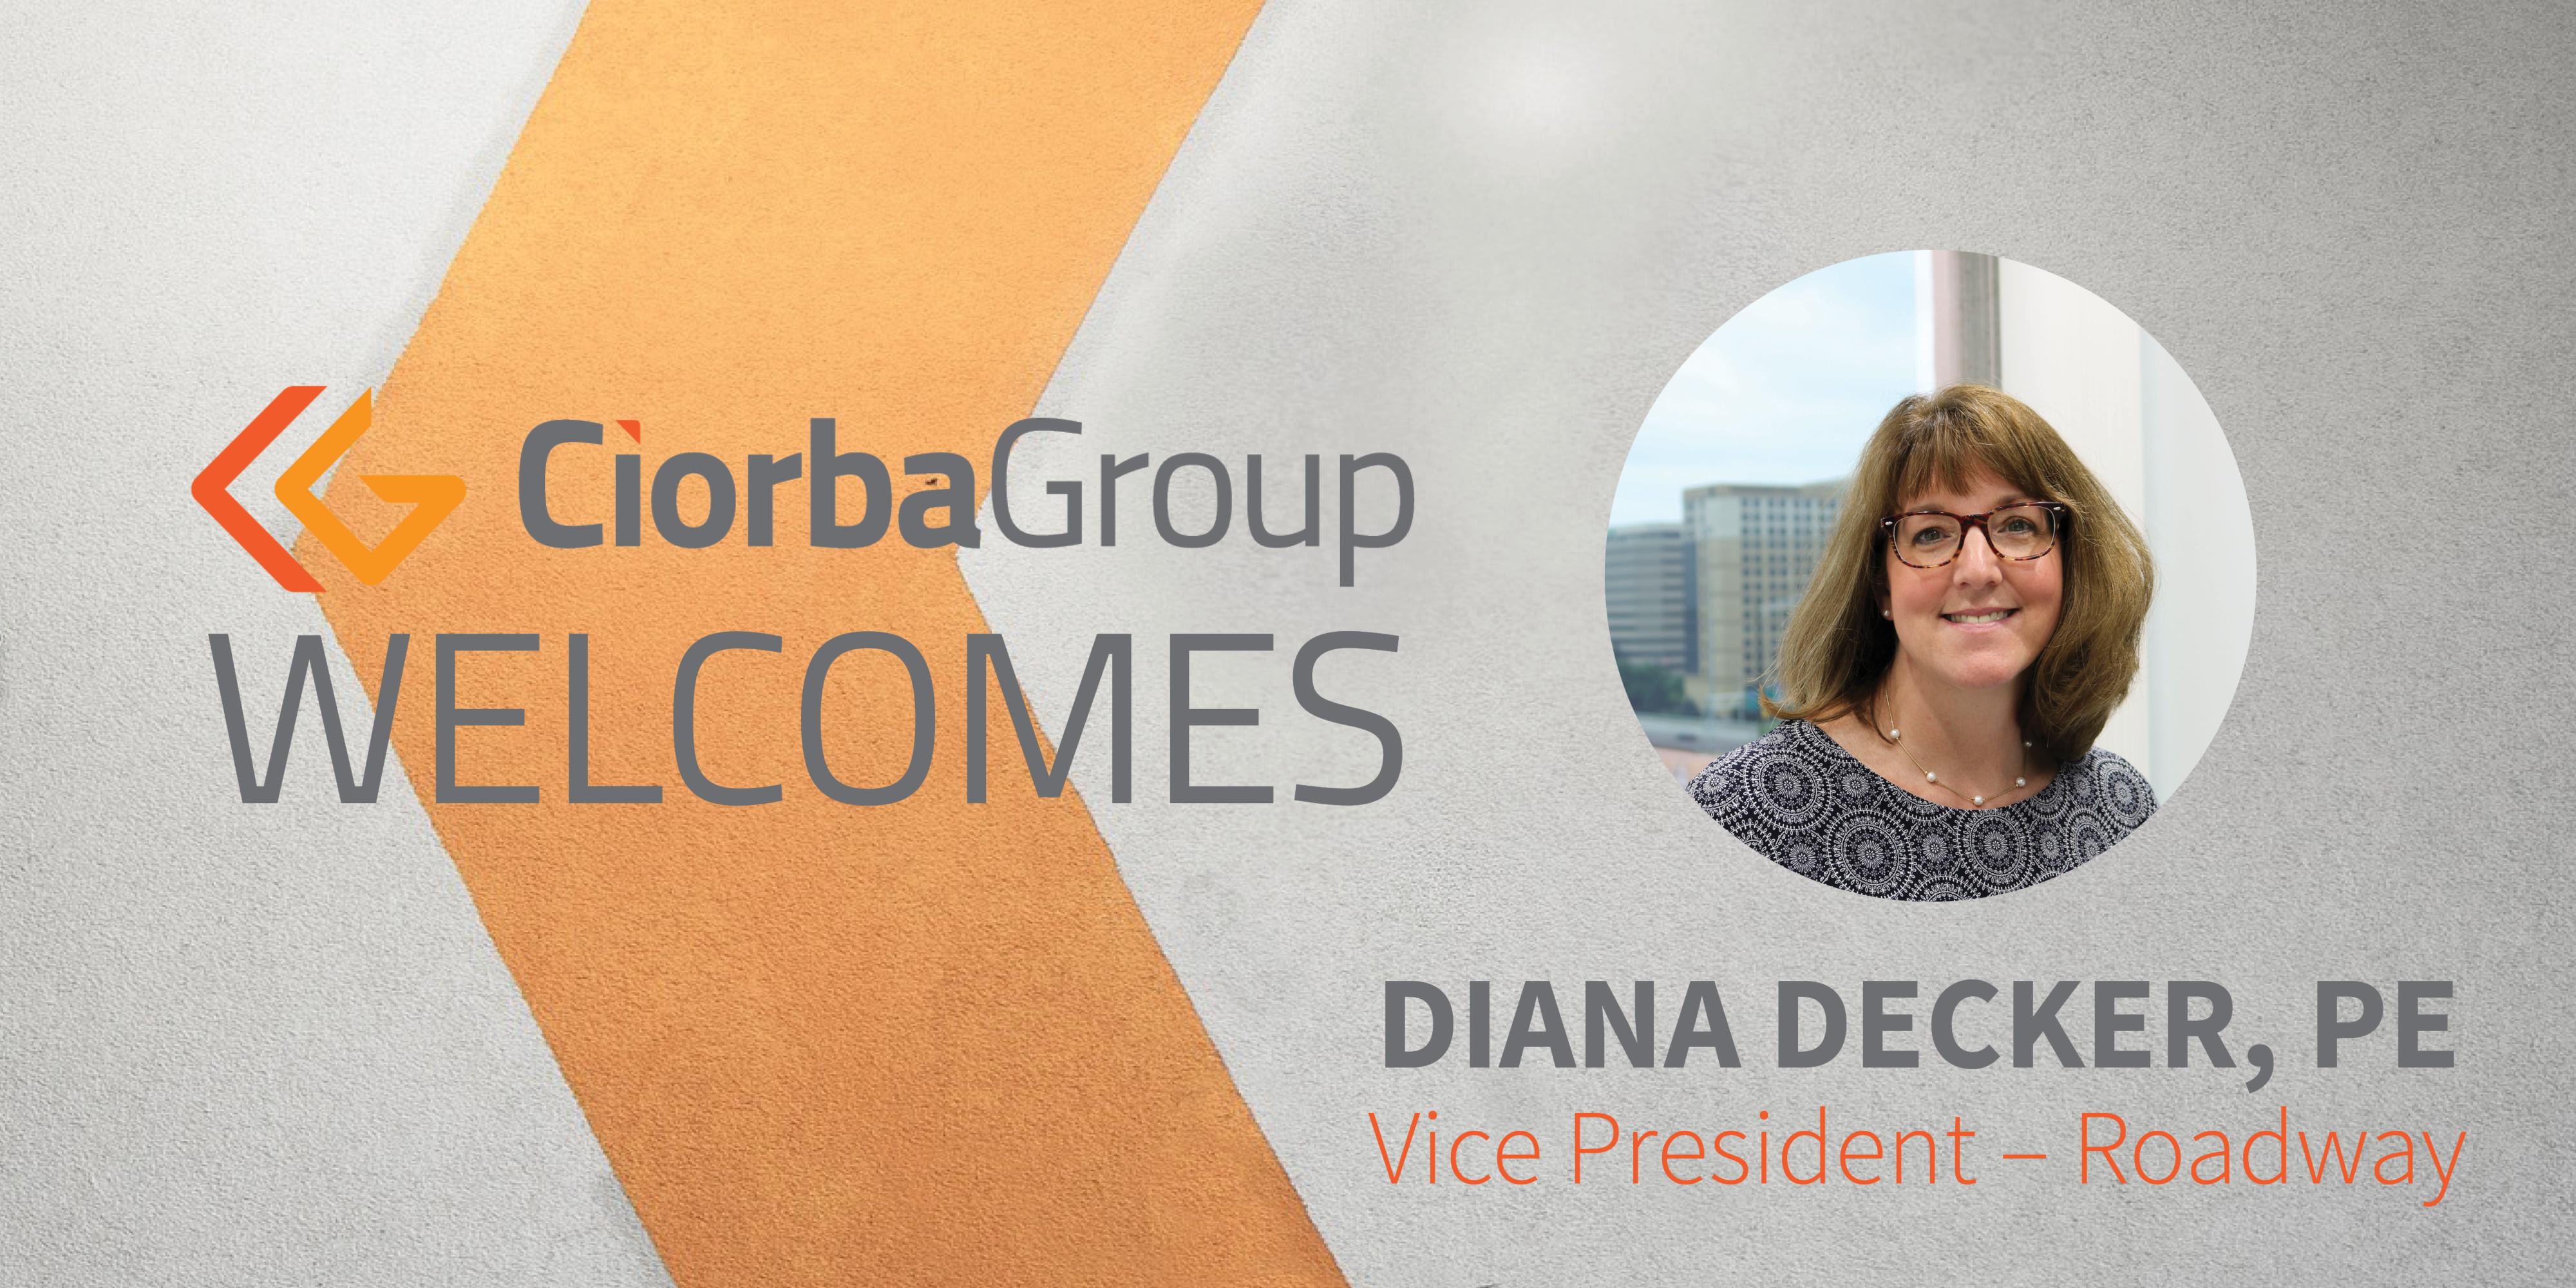 Diana Decker Vice President- Roadway | Ciorba Group